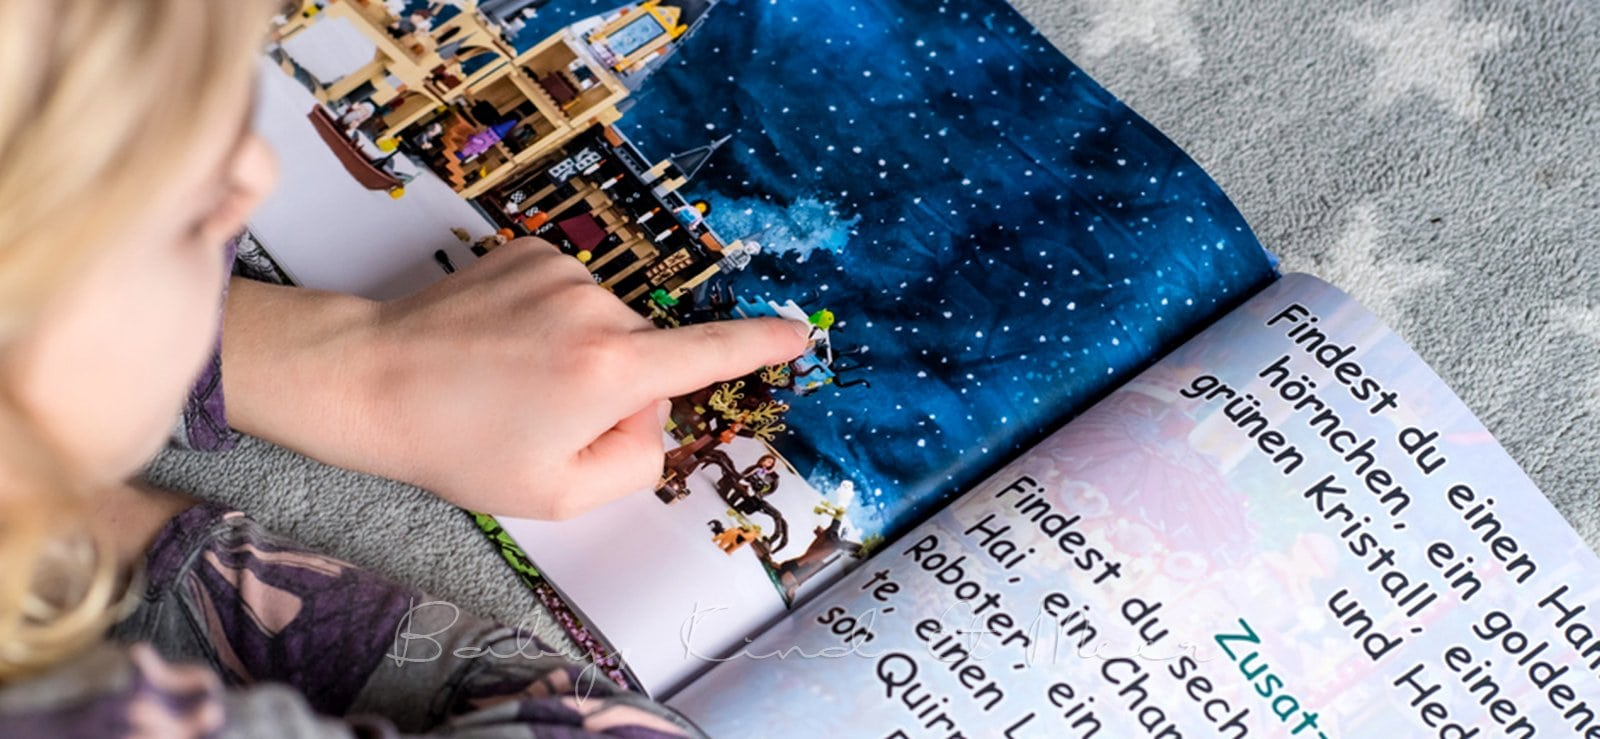 Lego Wimmelbuch selber machen 20